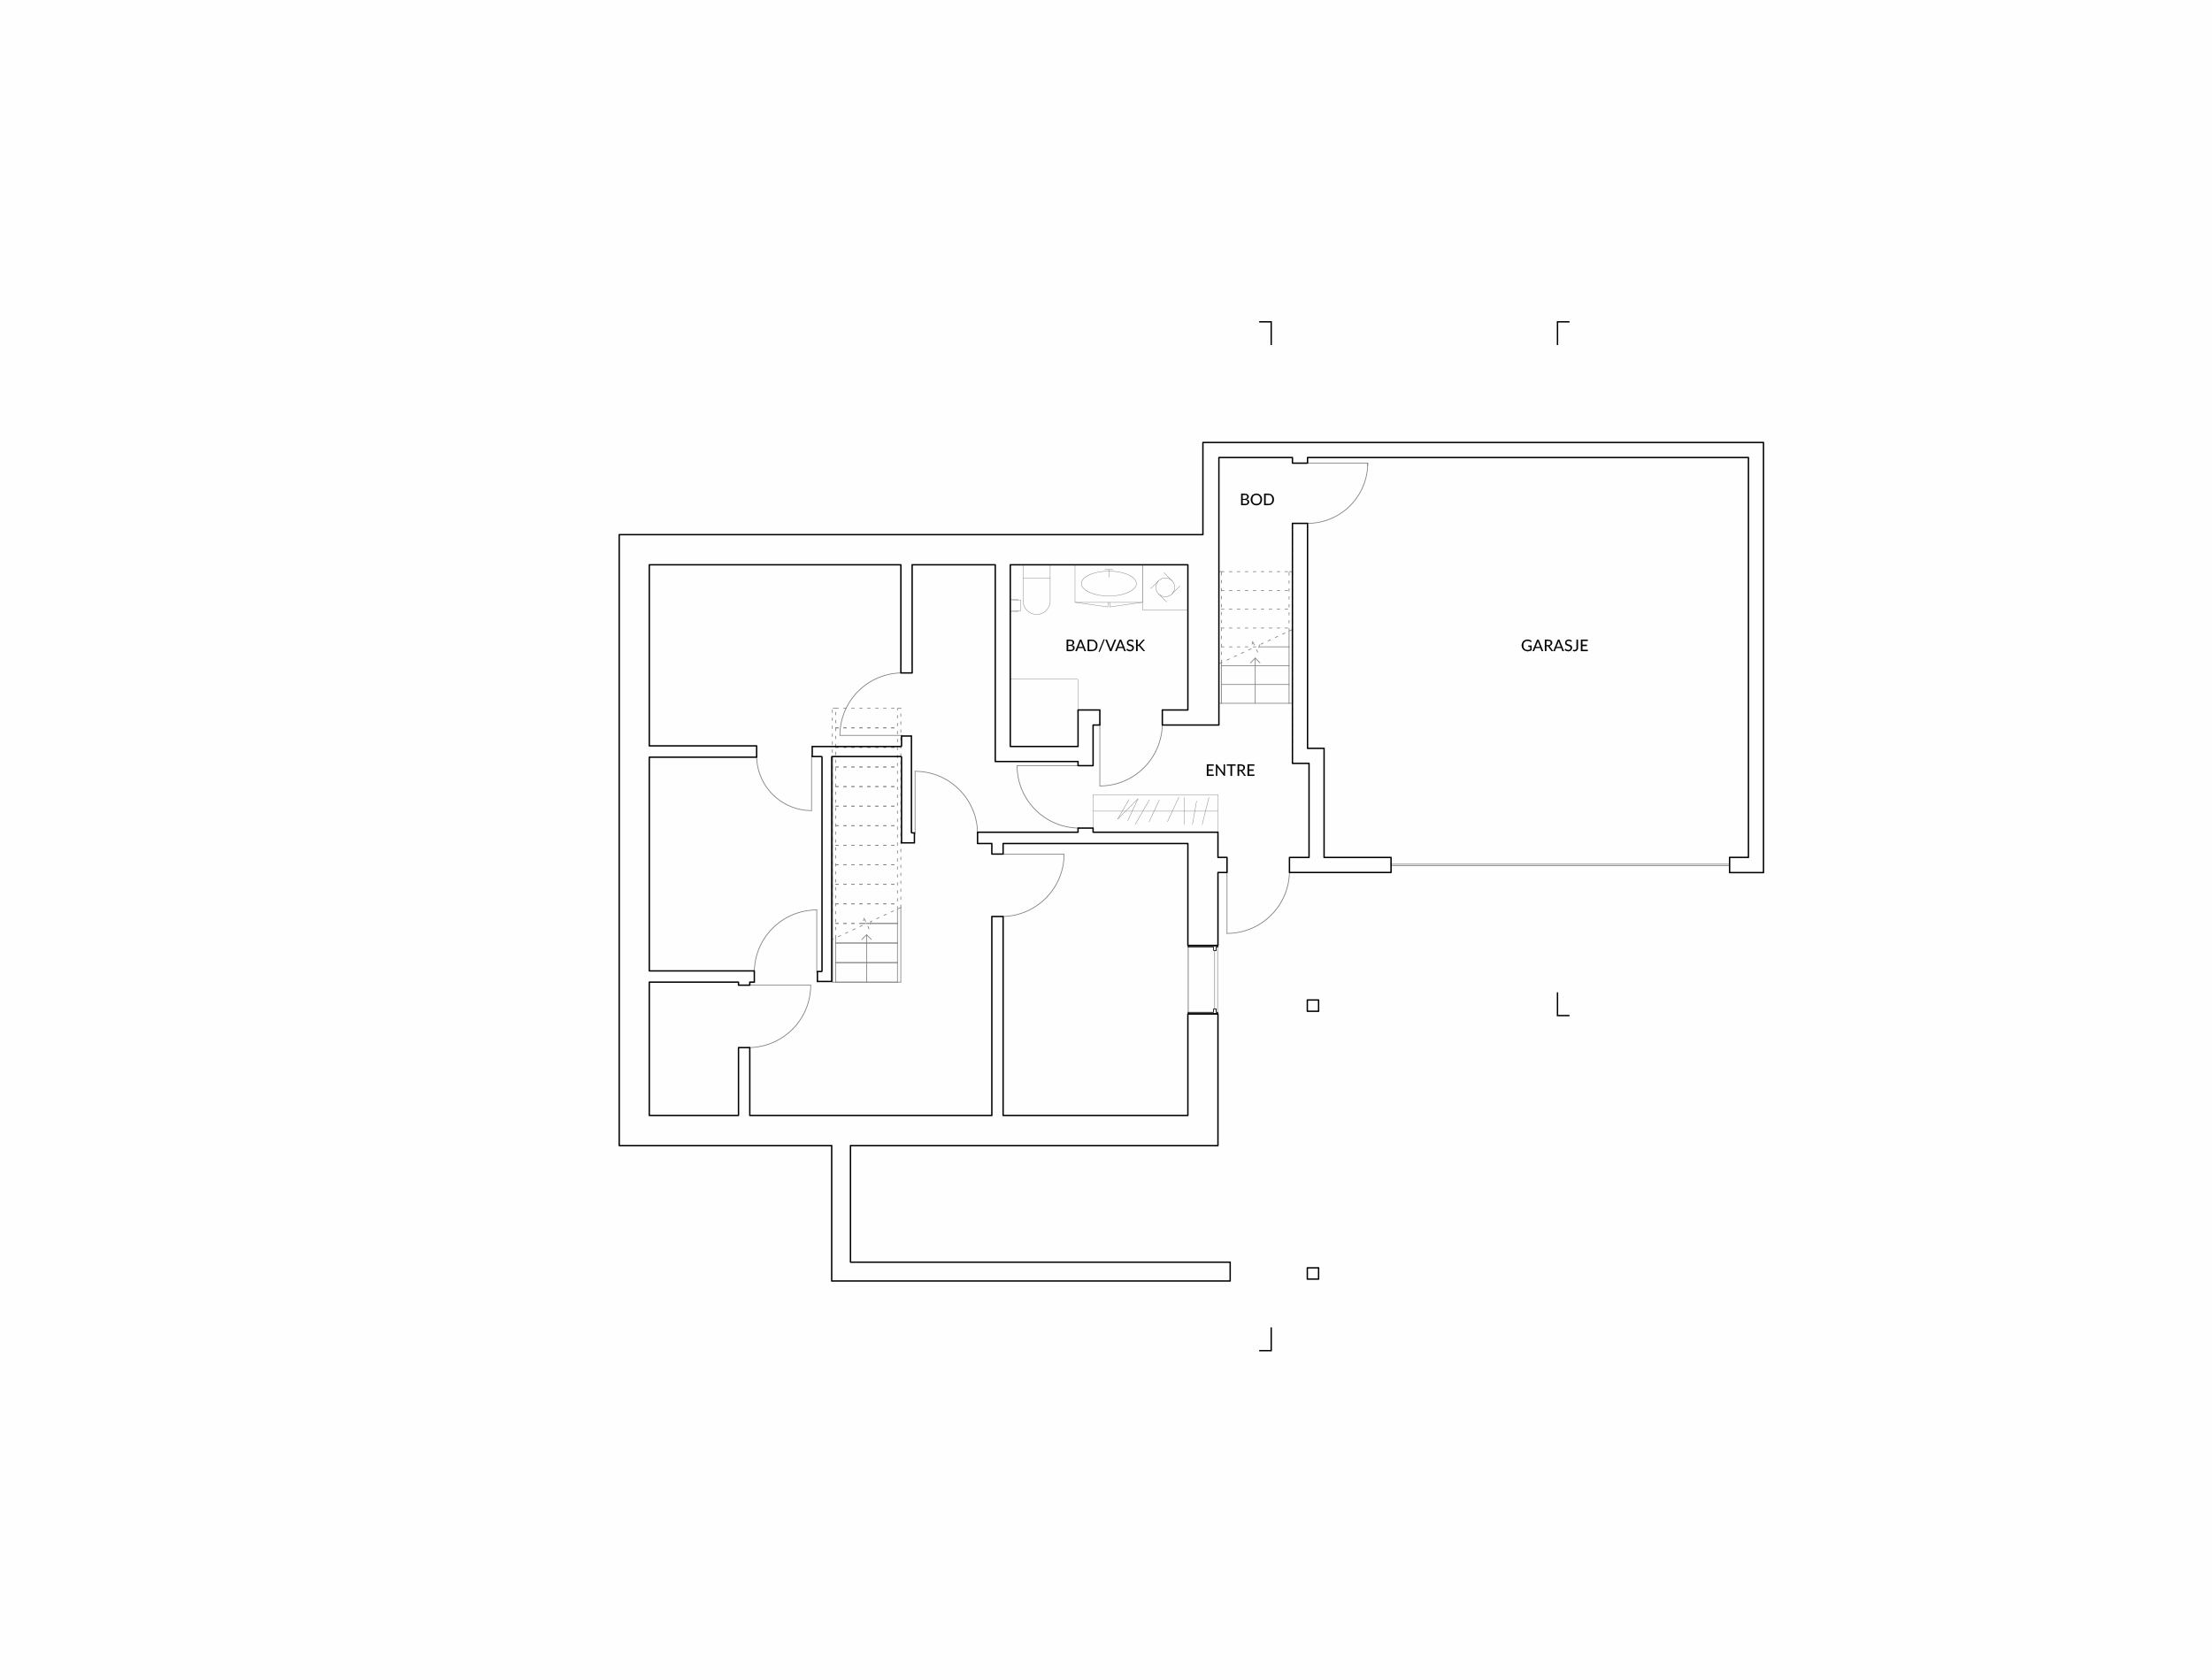 Forunderlig Arkitektur - 1603 - Plan 01